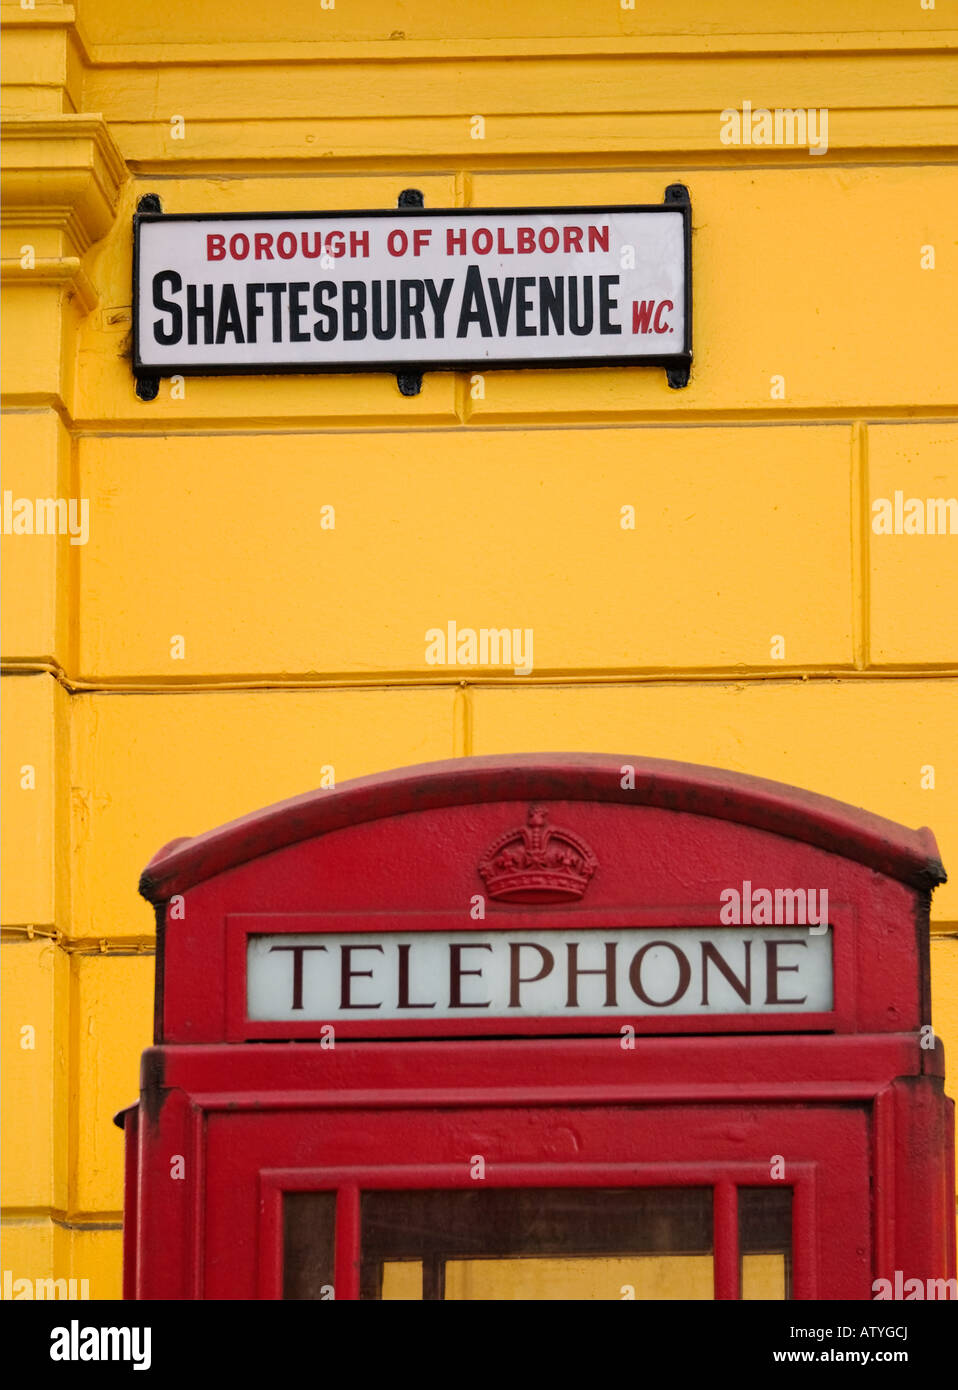 Shaftesbury Avenue London - Stock Image